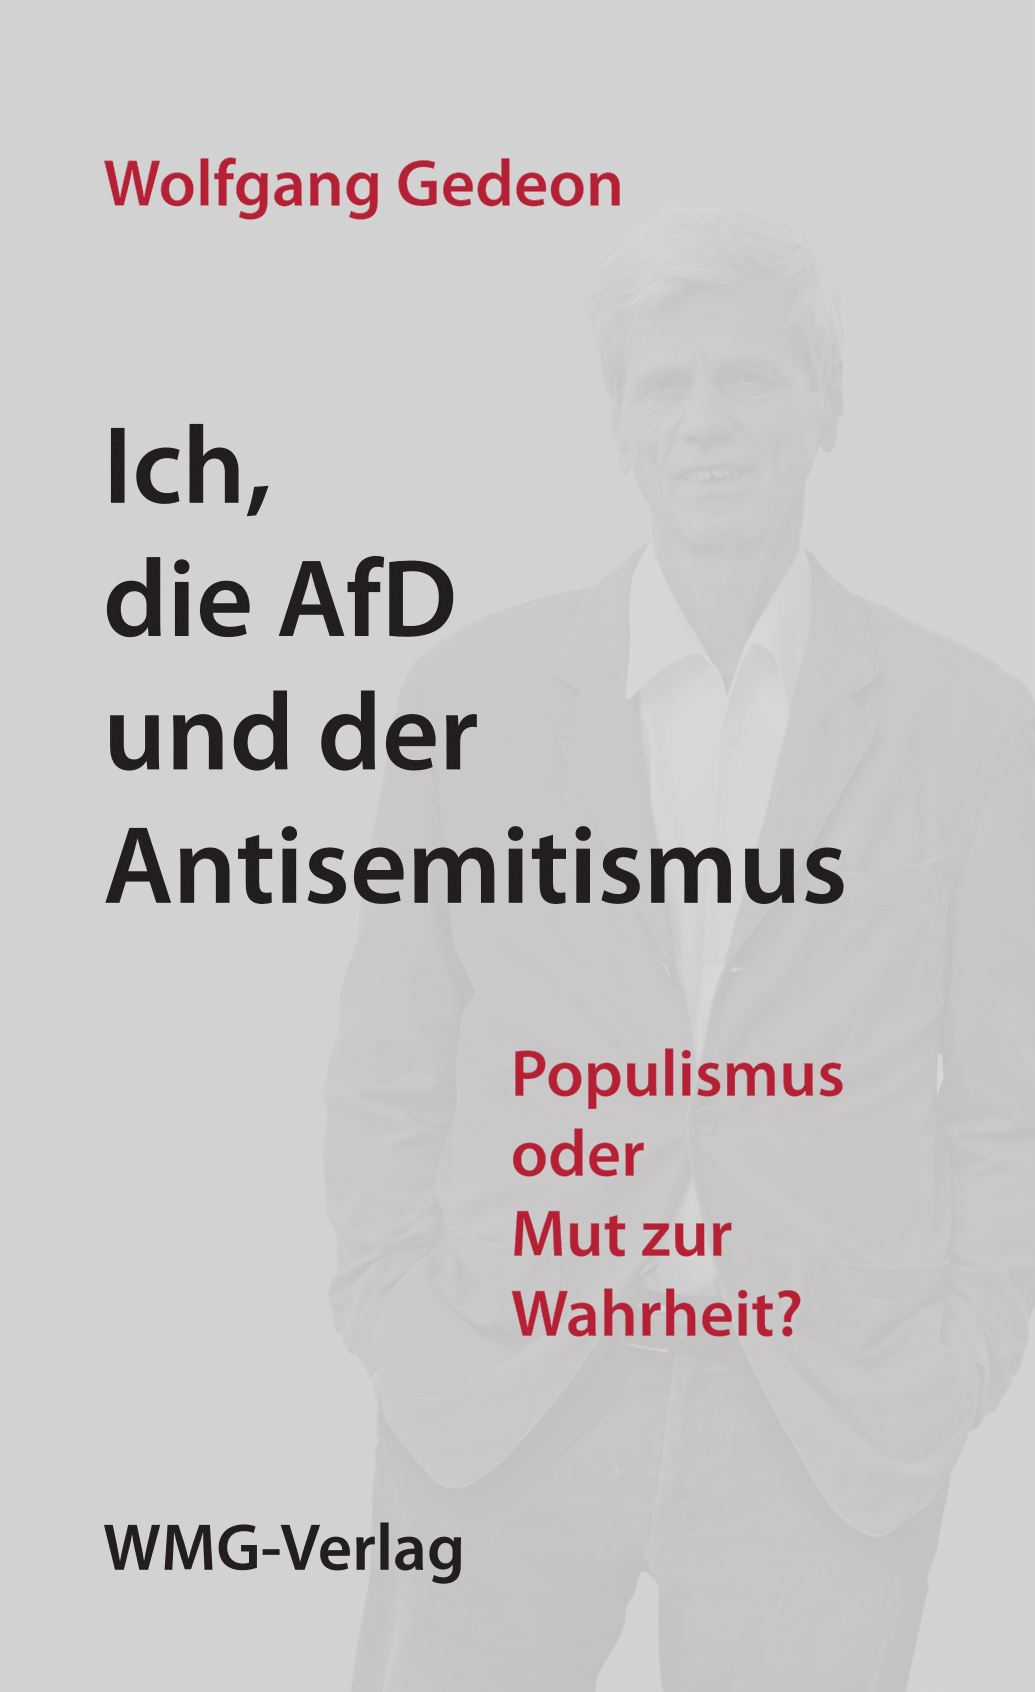 Dr. Wolfgang Gedeons Webseite